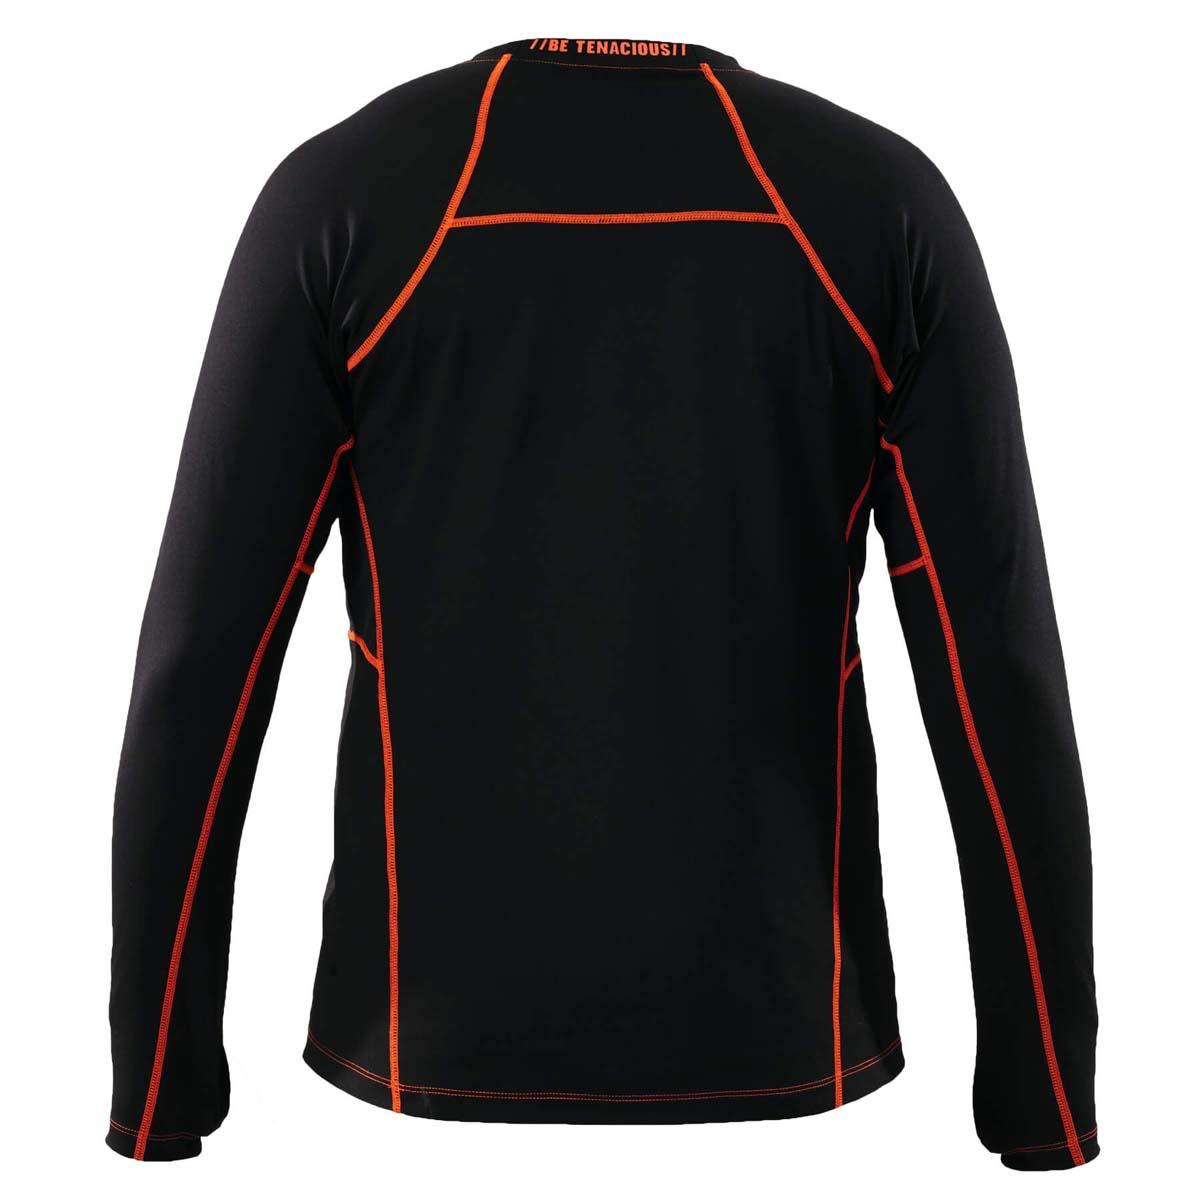 6435 L Black Long Sleeve